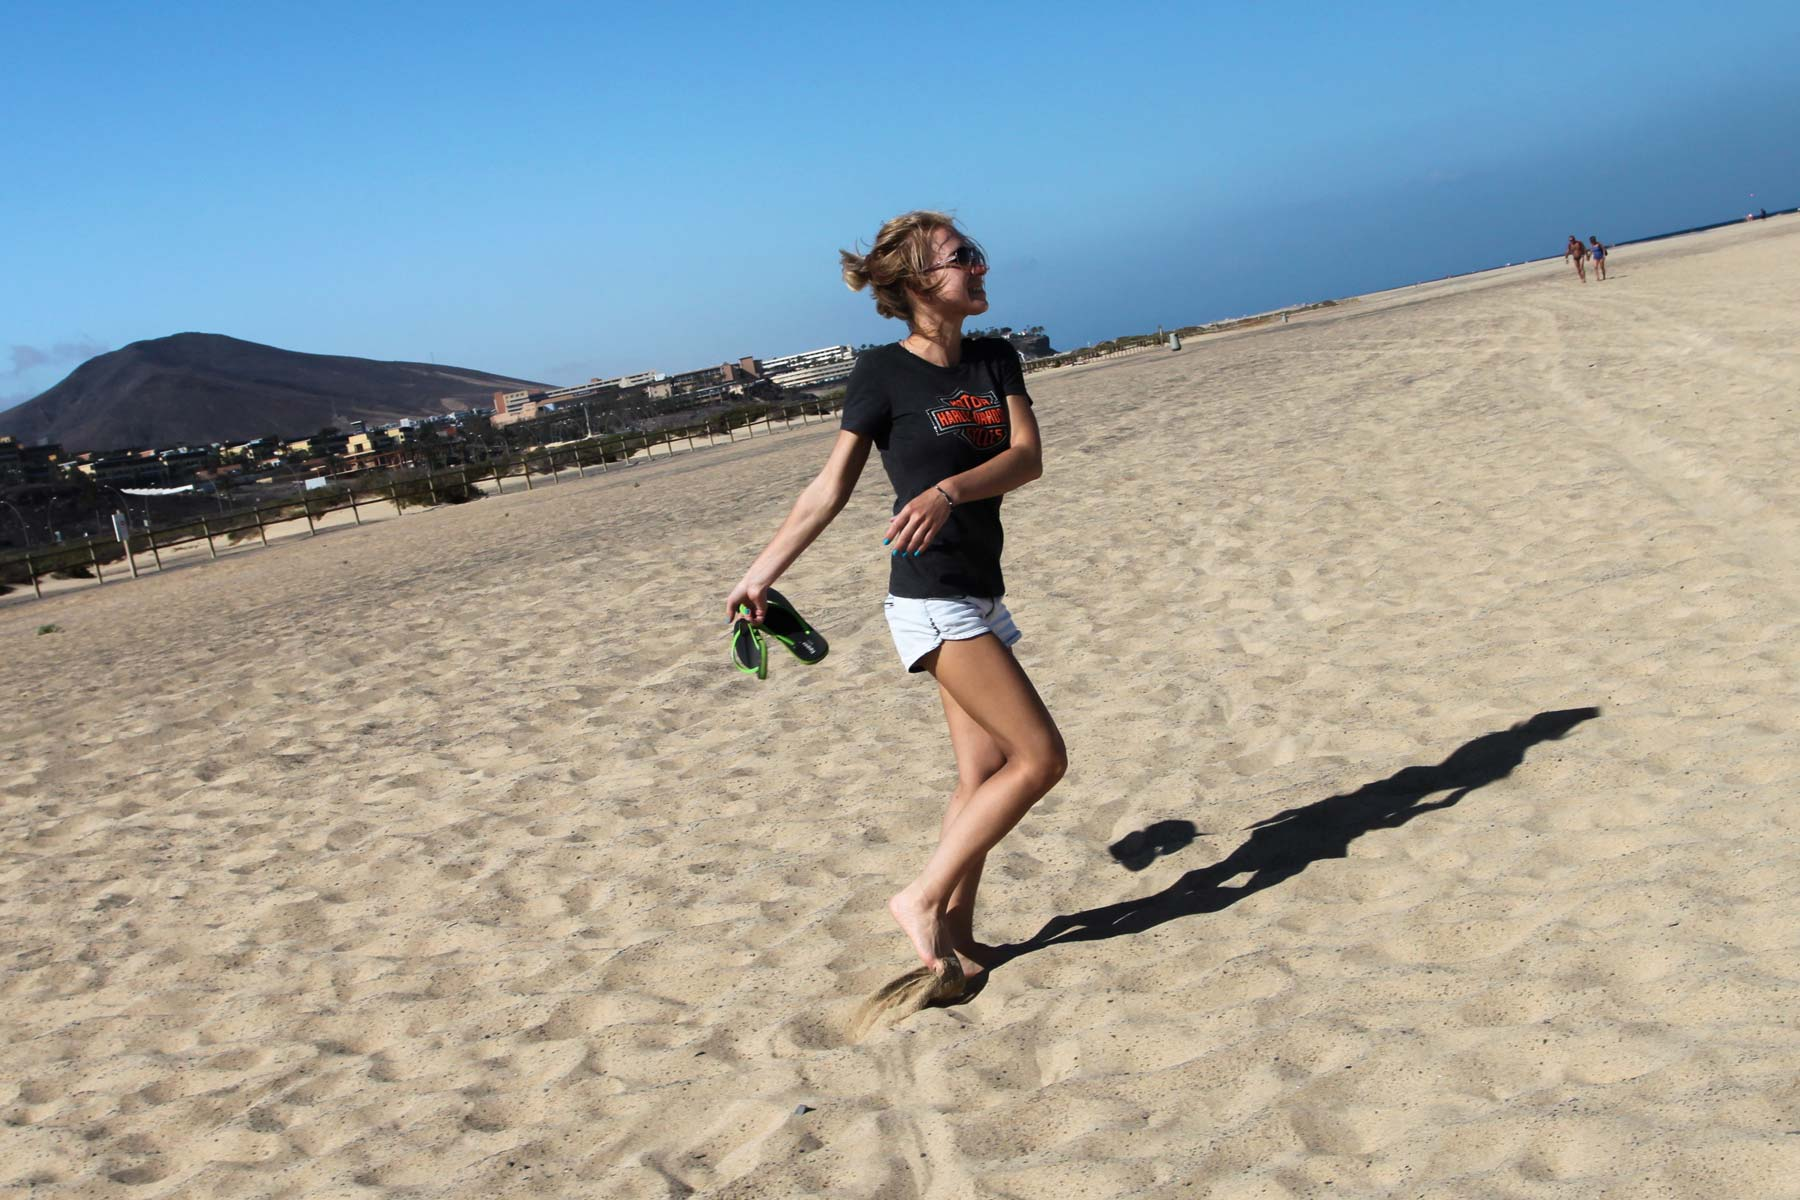 Море, солнце и песок на пляже Фуэртевентуры